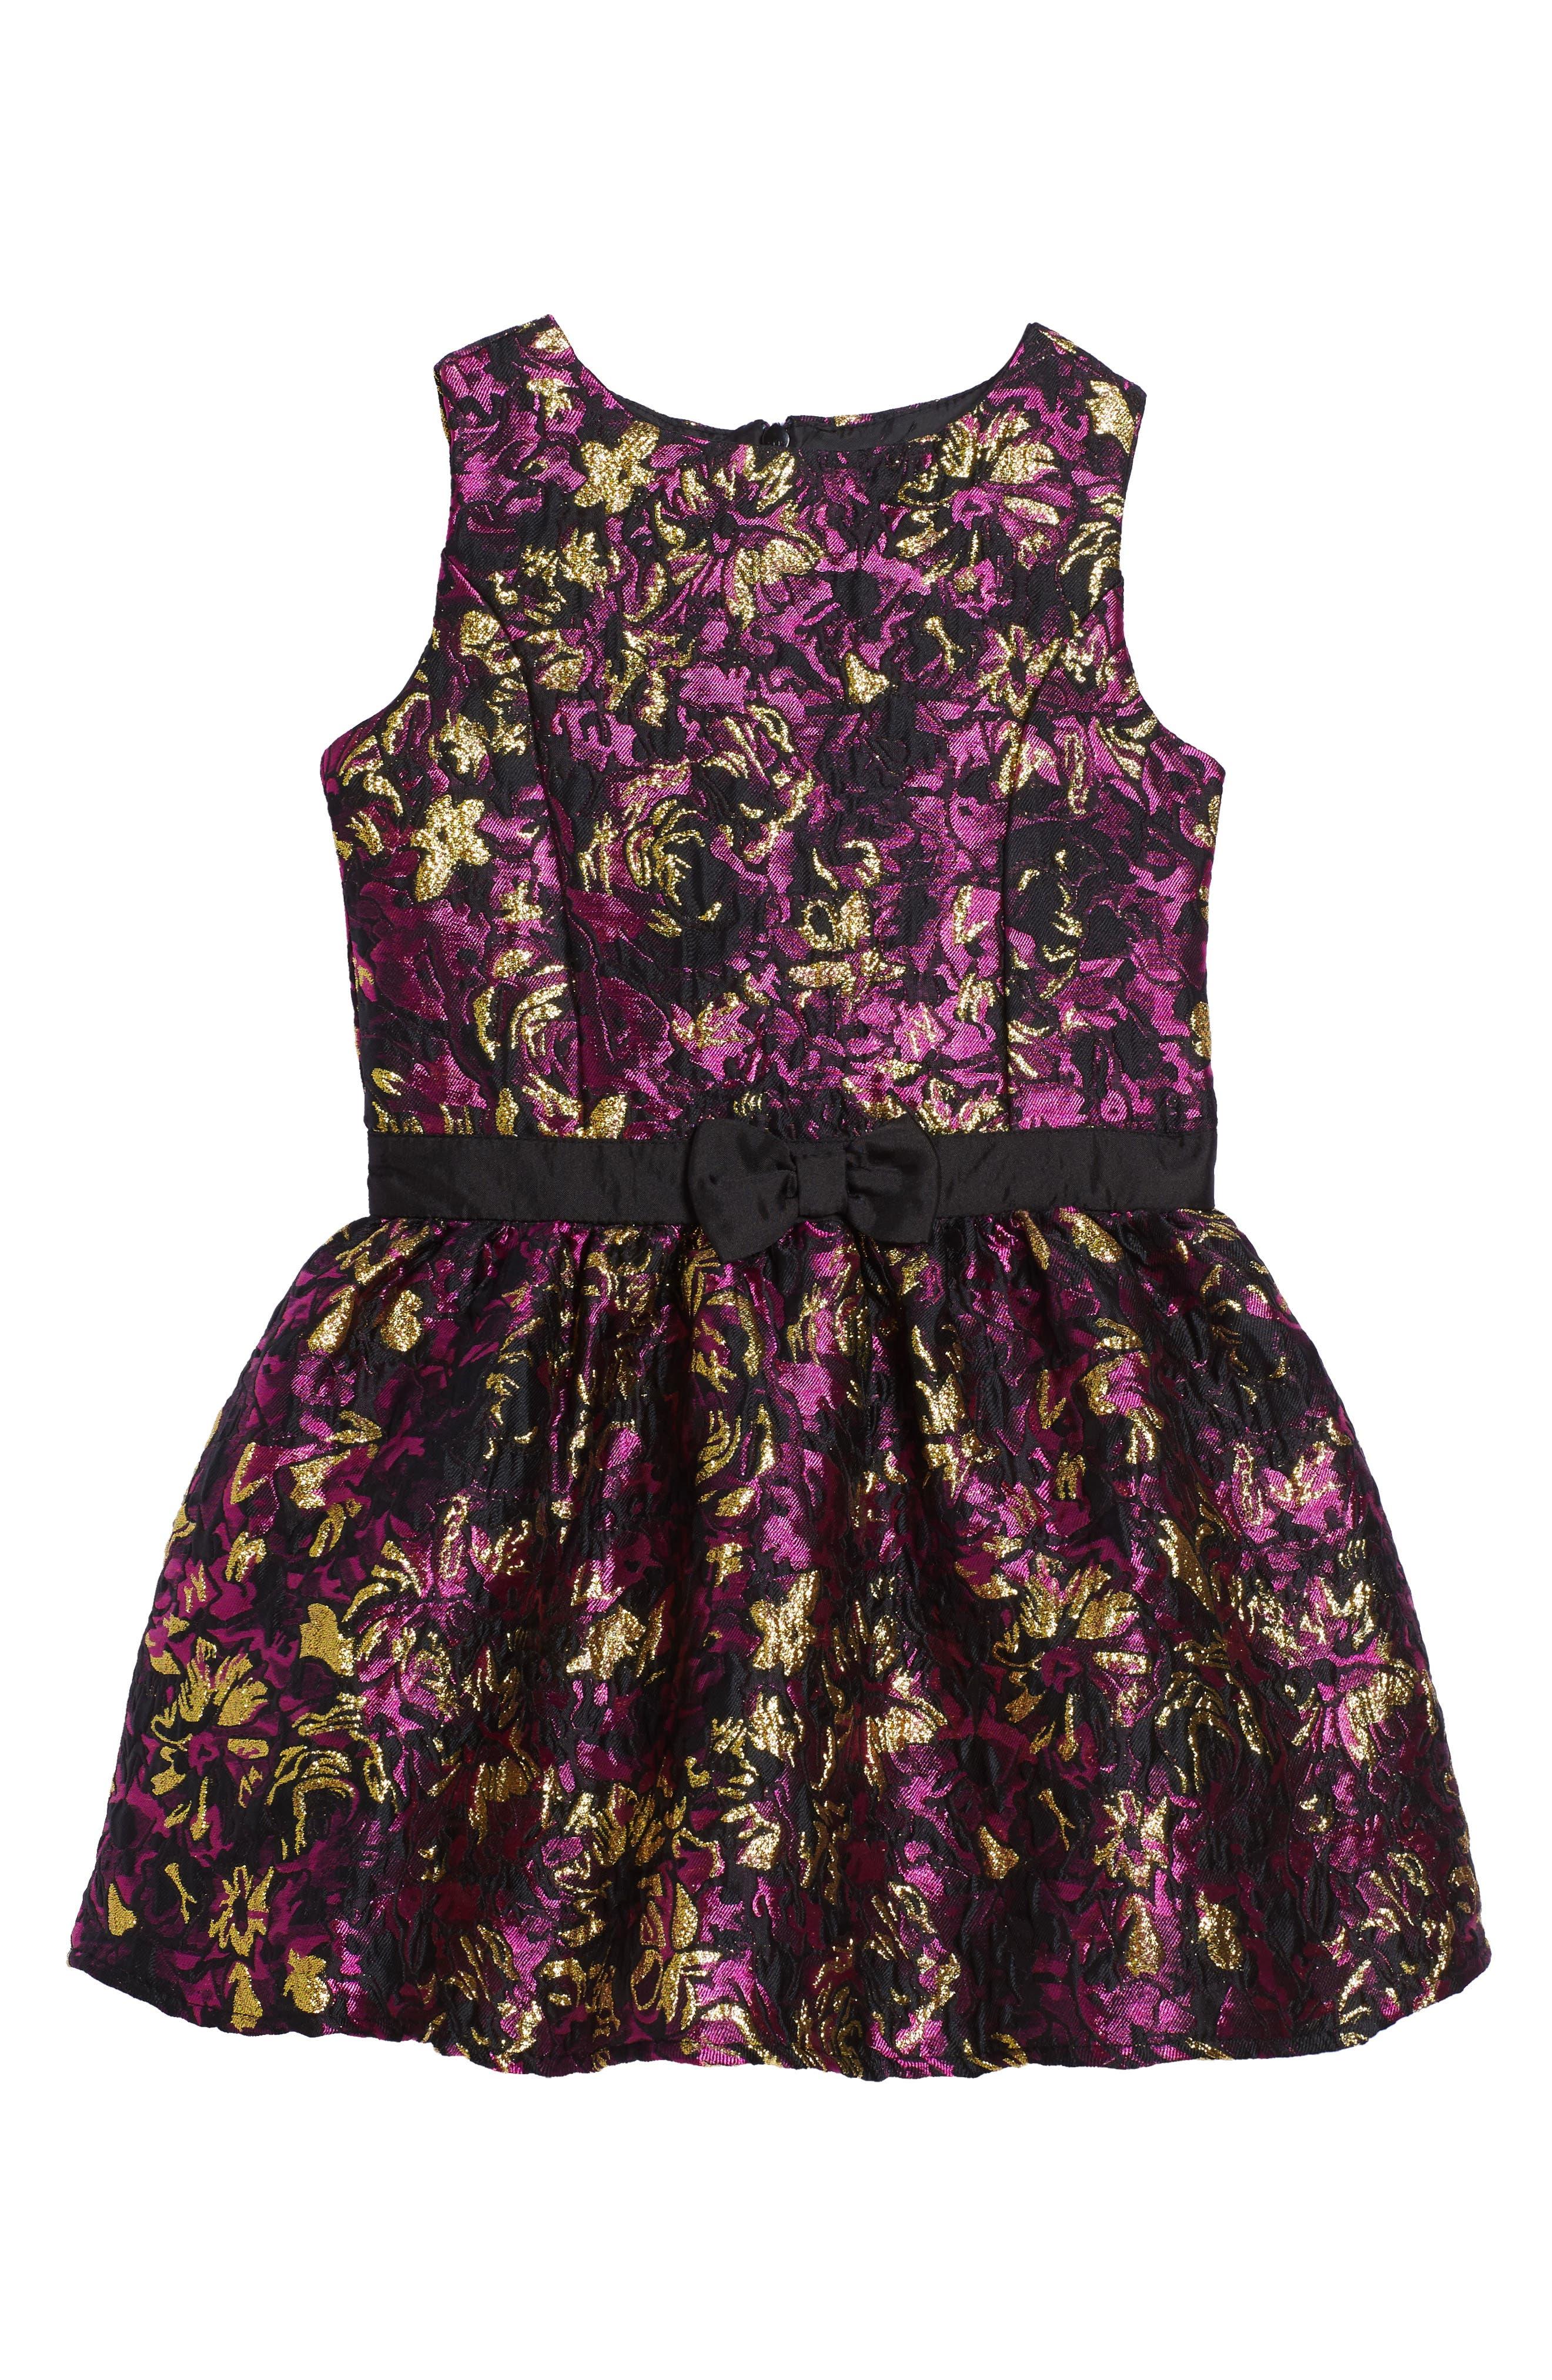 Main Image - LIttle Angels Floral Brocade Dress (Toddler Girls & Little Girls)